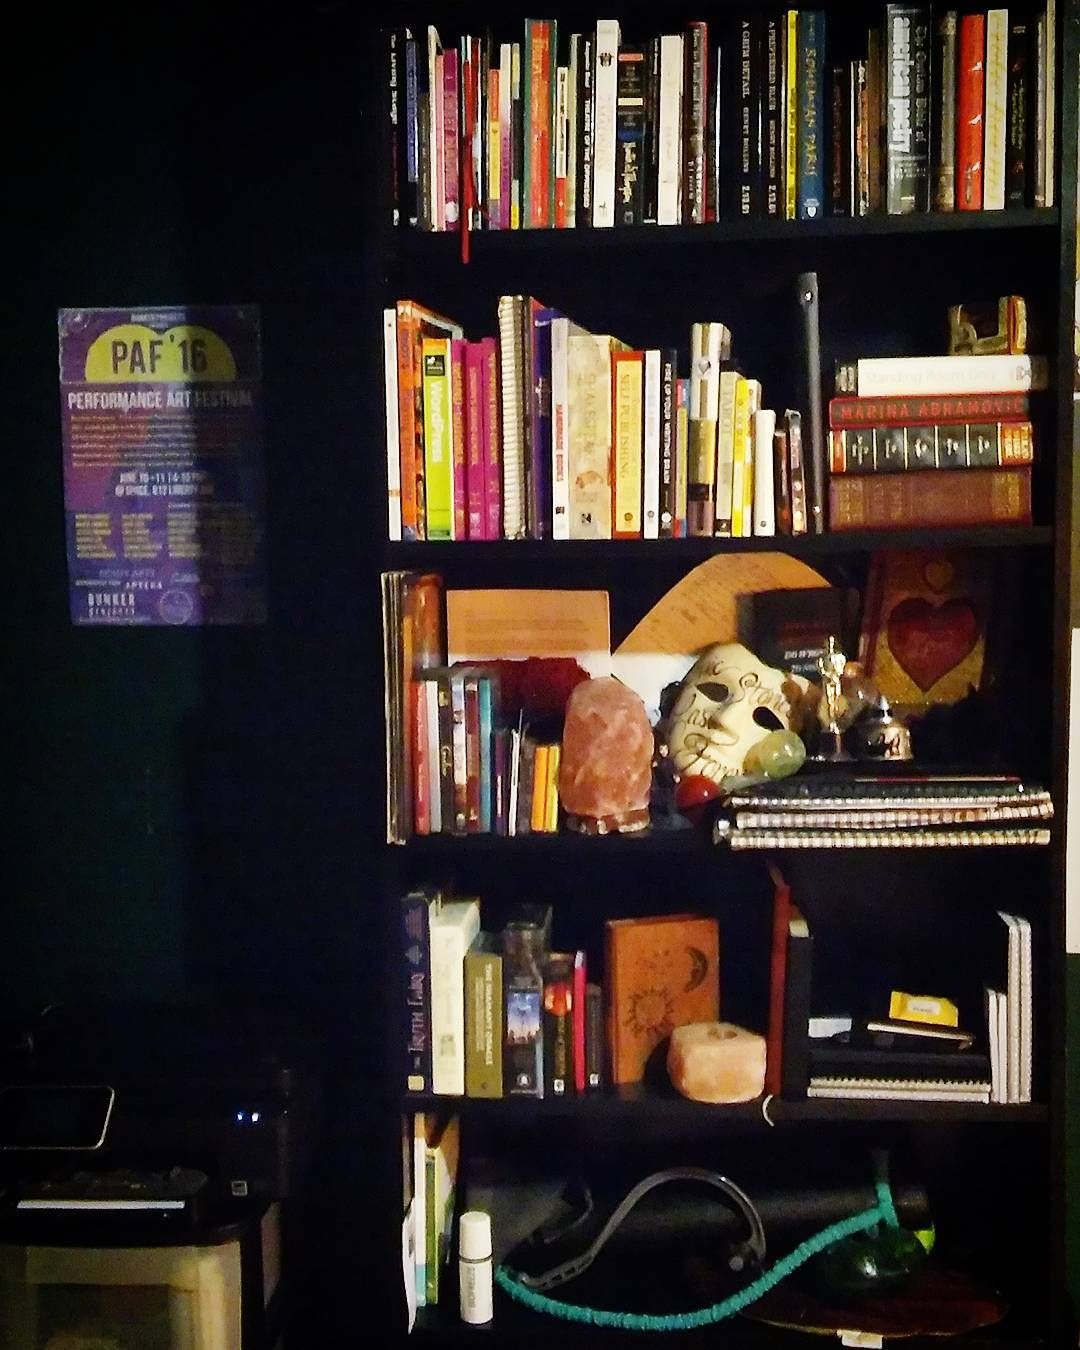 Organized Bookshelf Sapiosexy Sexy Nerdporn Nobooksnosex Johnwaters Organization